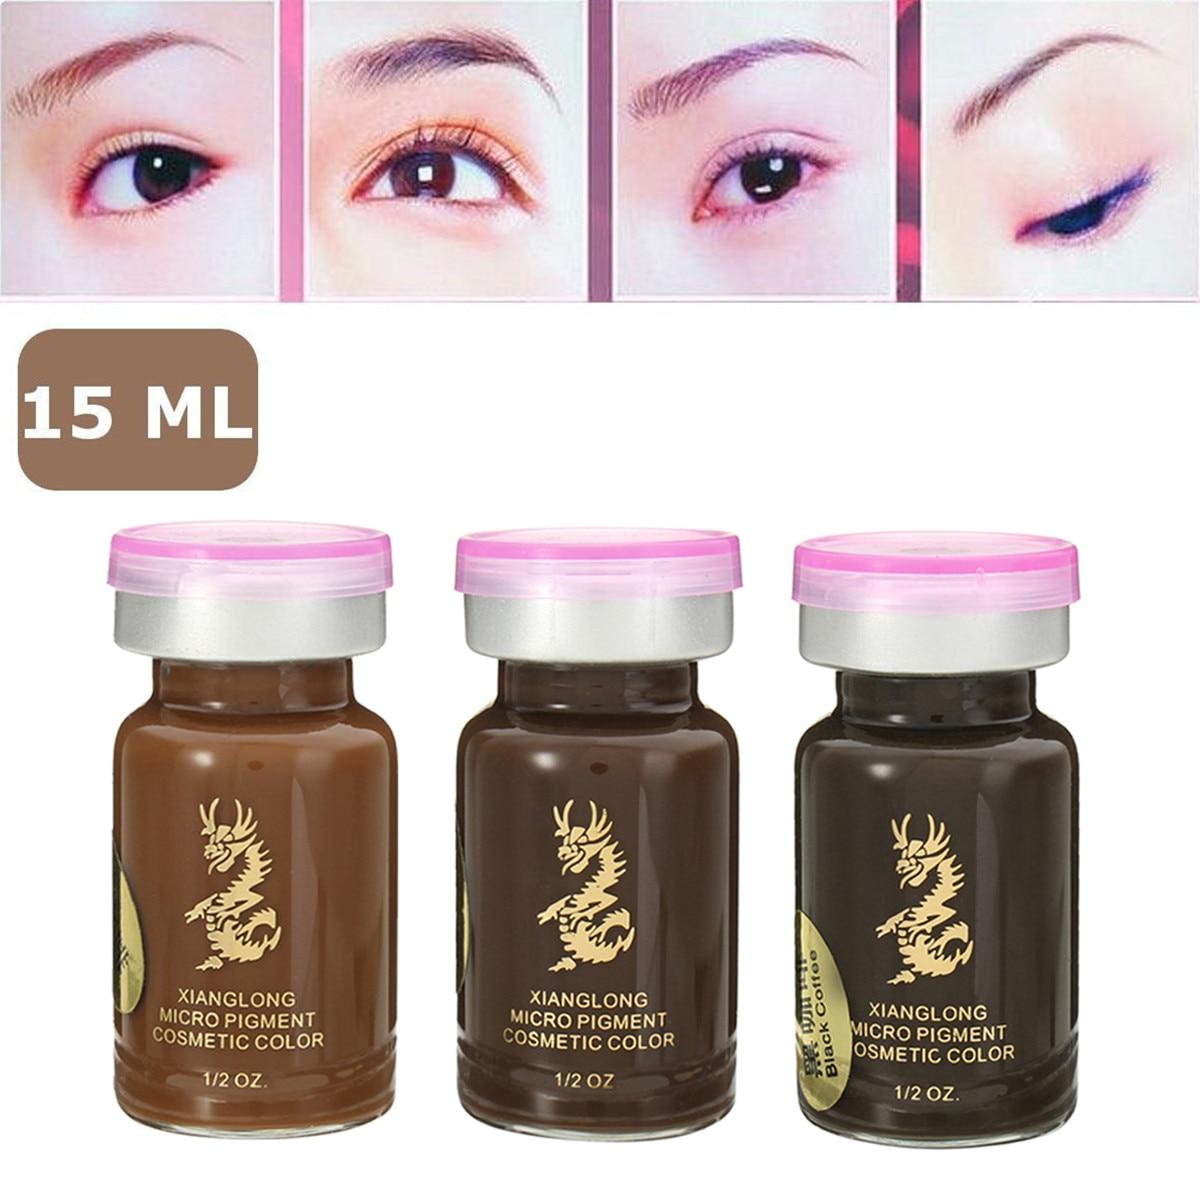 Semi-Permanent Eyebrow Tattoo Ink Professional Makeup Pigment 3D Micropigmentation Brows Ink Emulsions 3 Colors 15ml